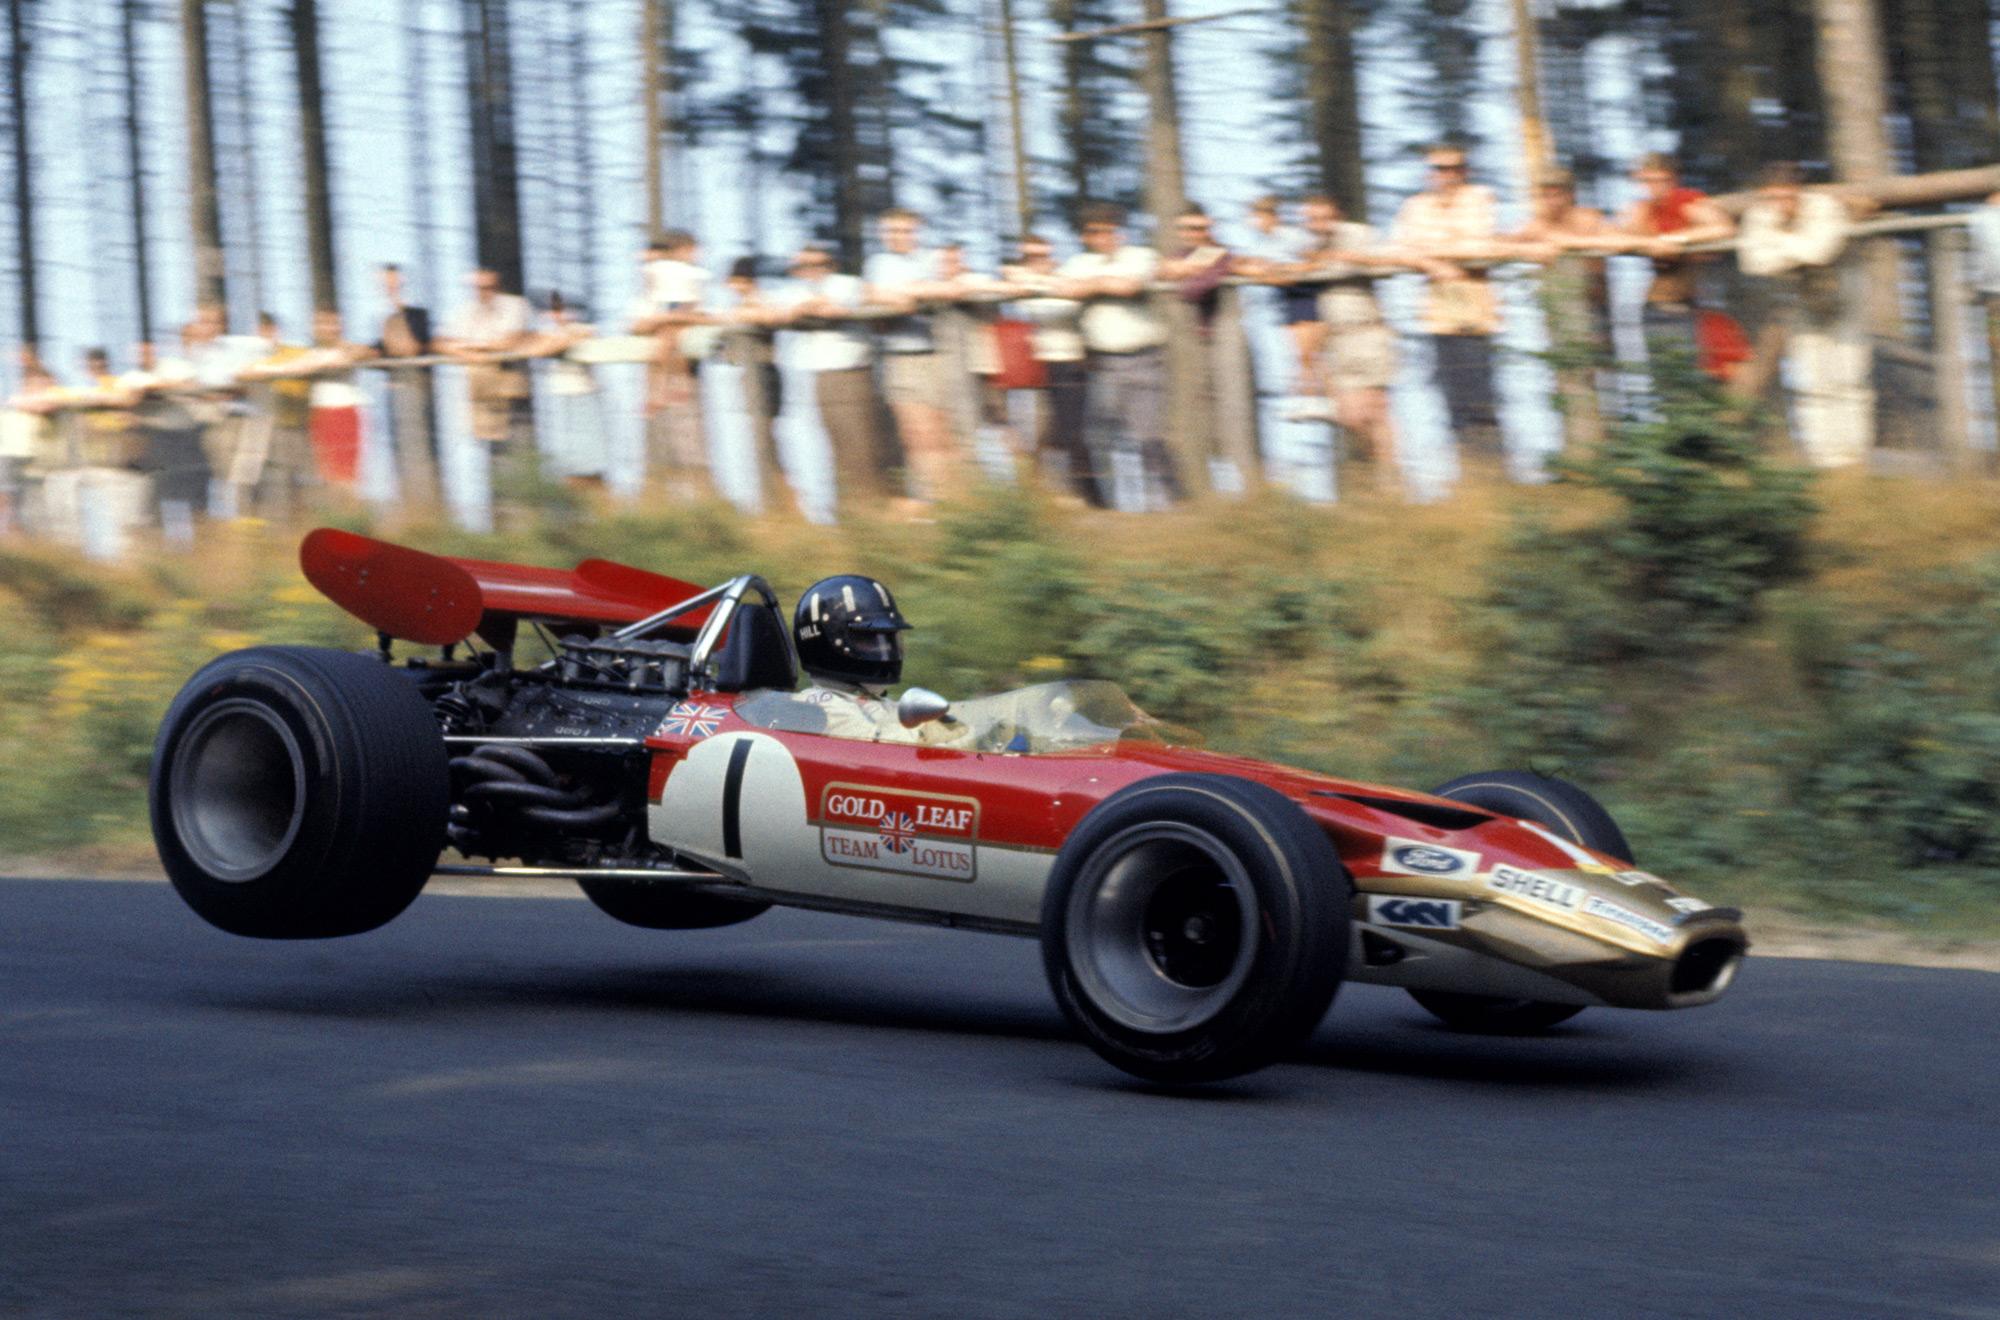 F1 transcurso en imagenes 1950 2014 megapost taringa